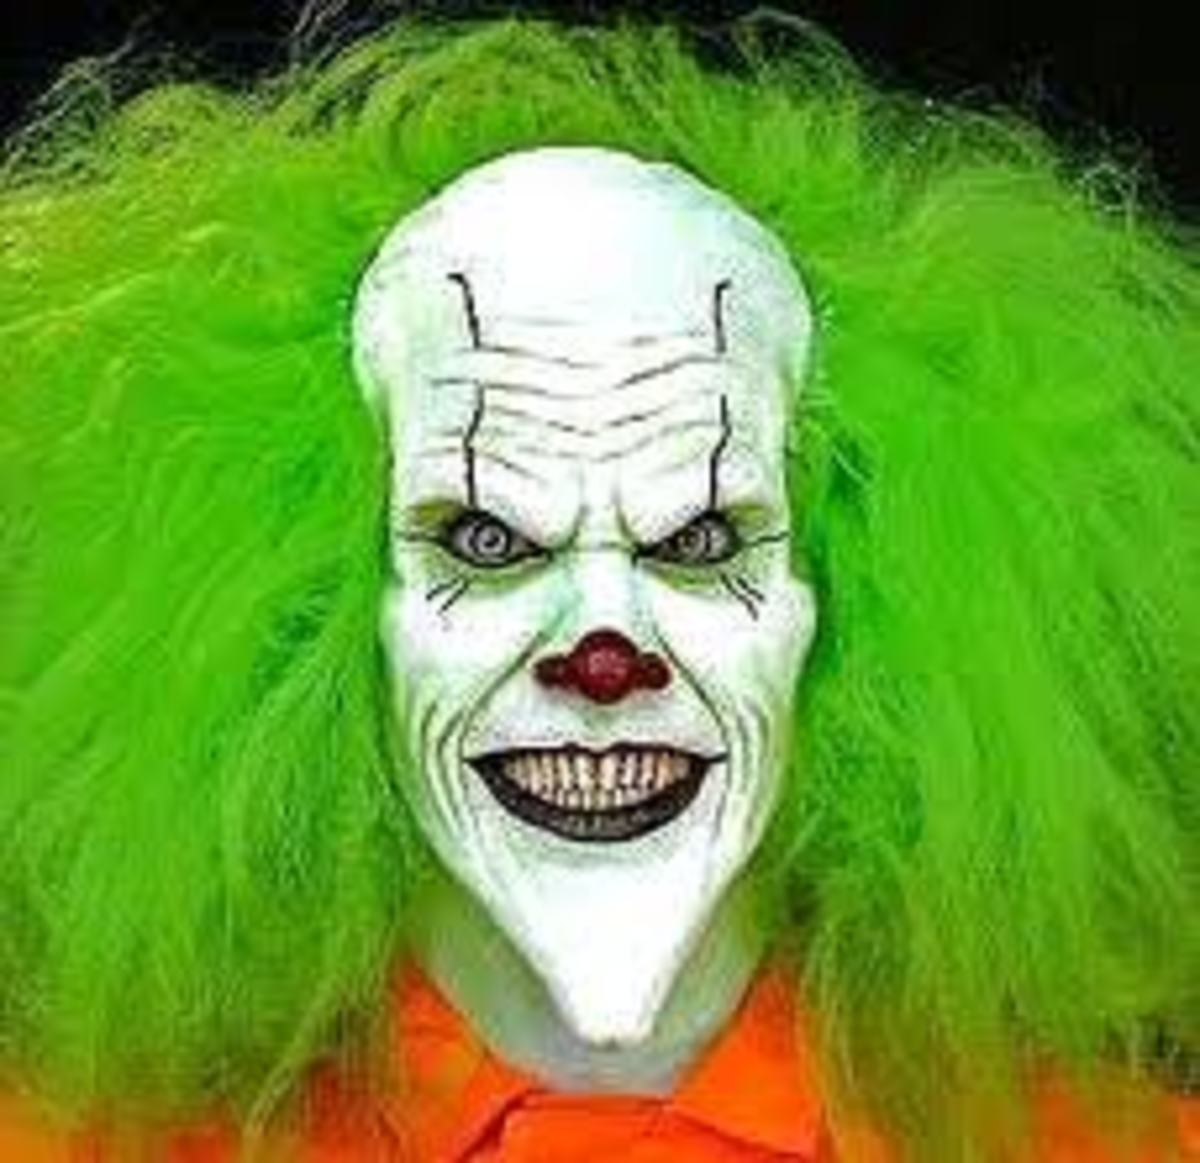 Midget Clown Urban Legend 114